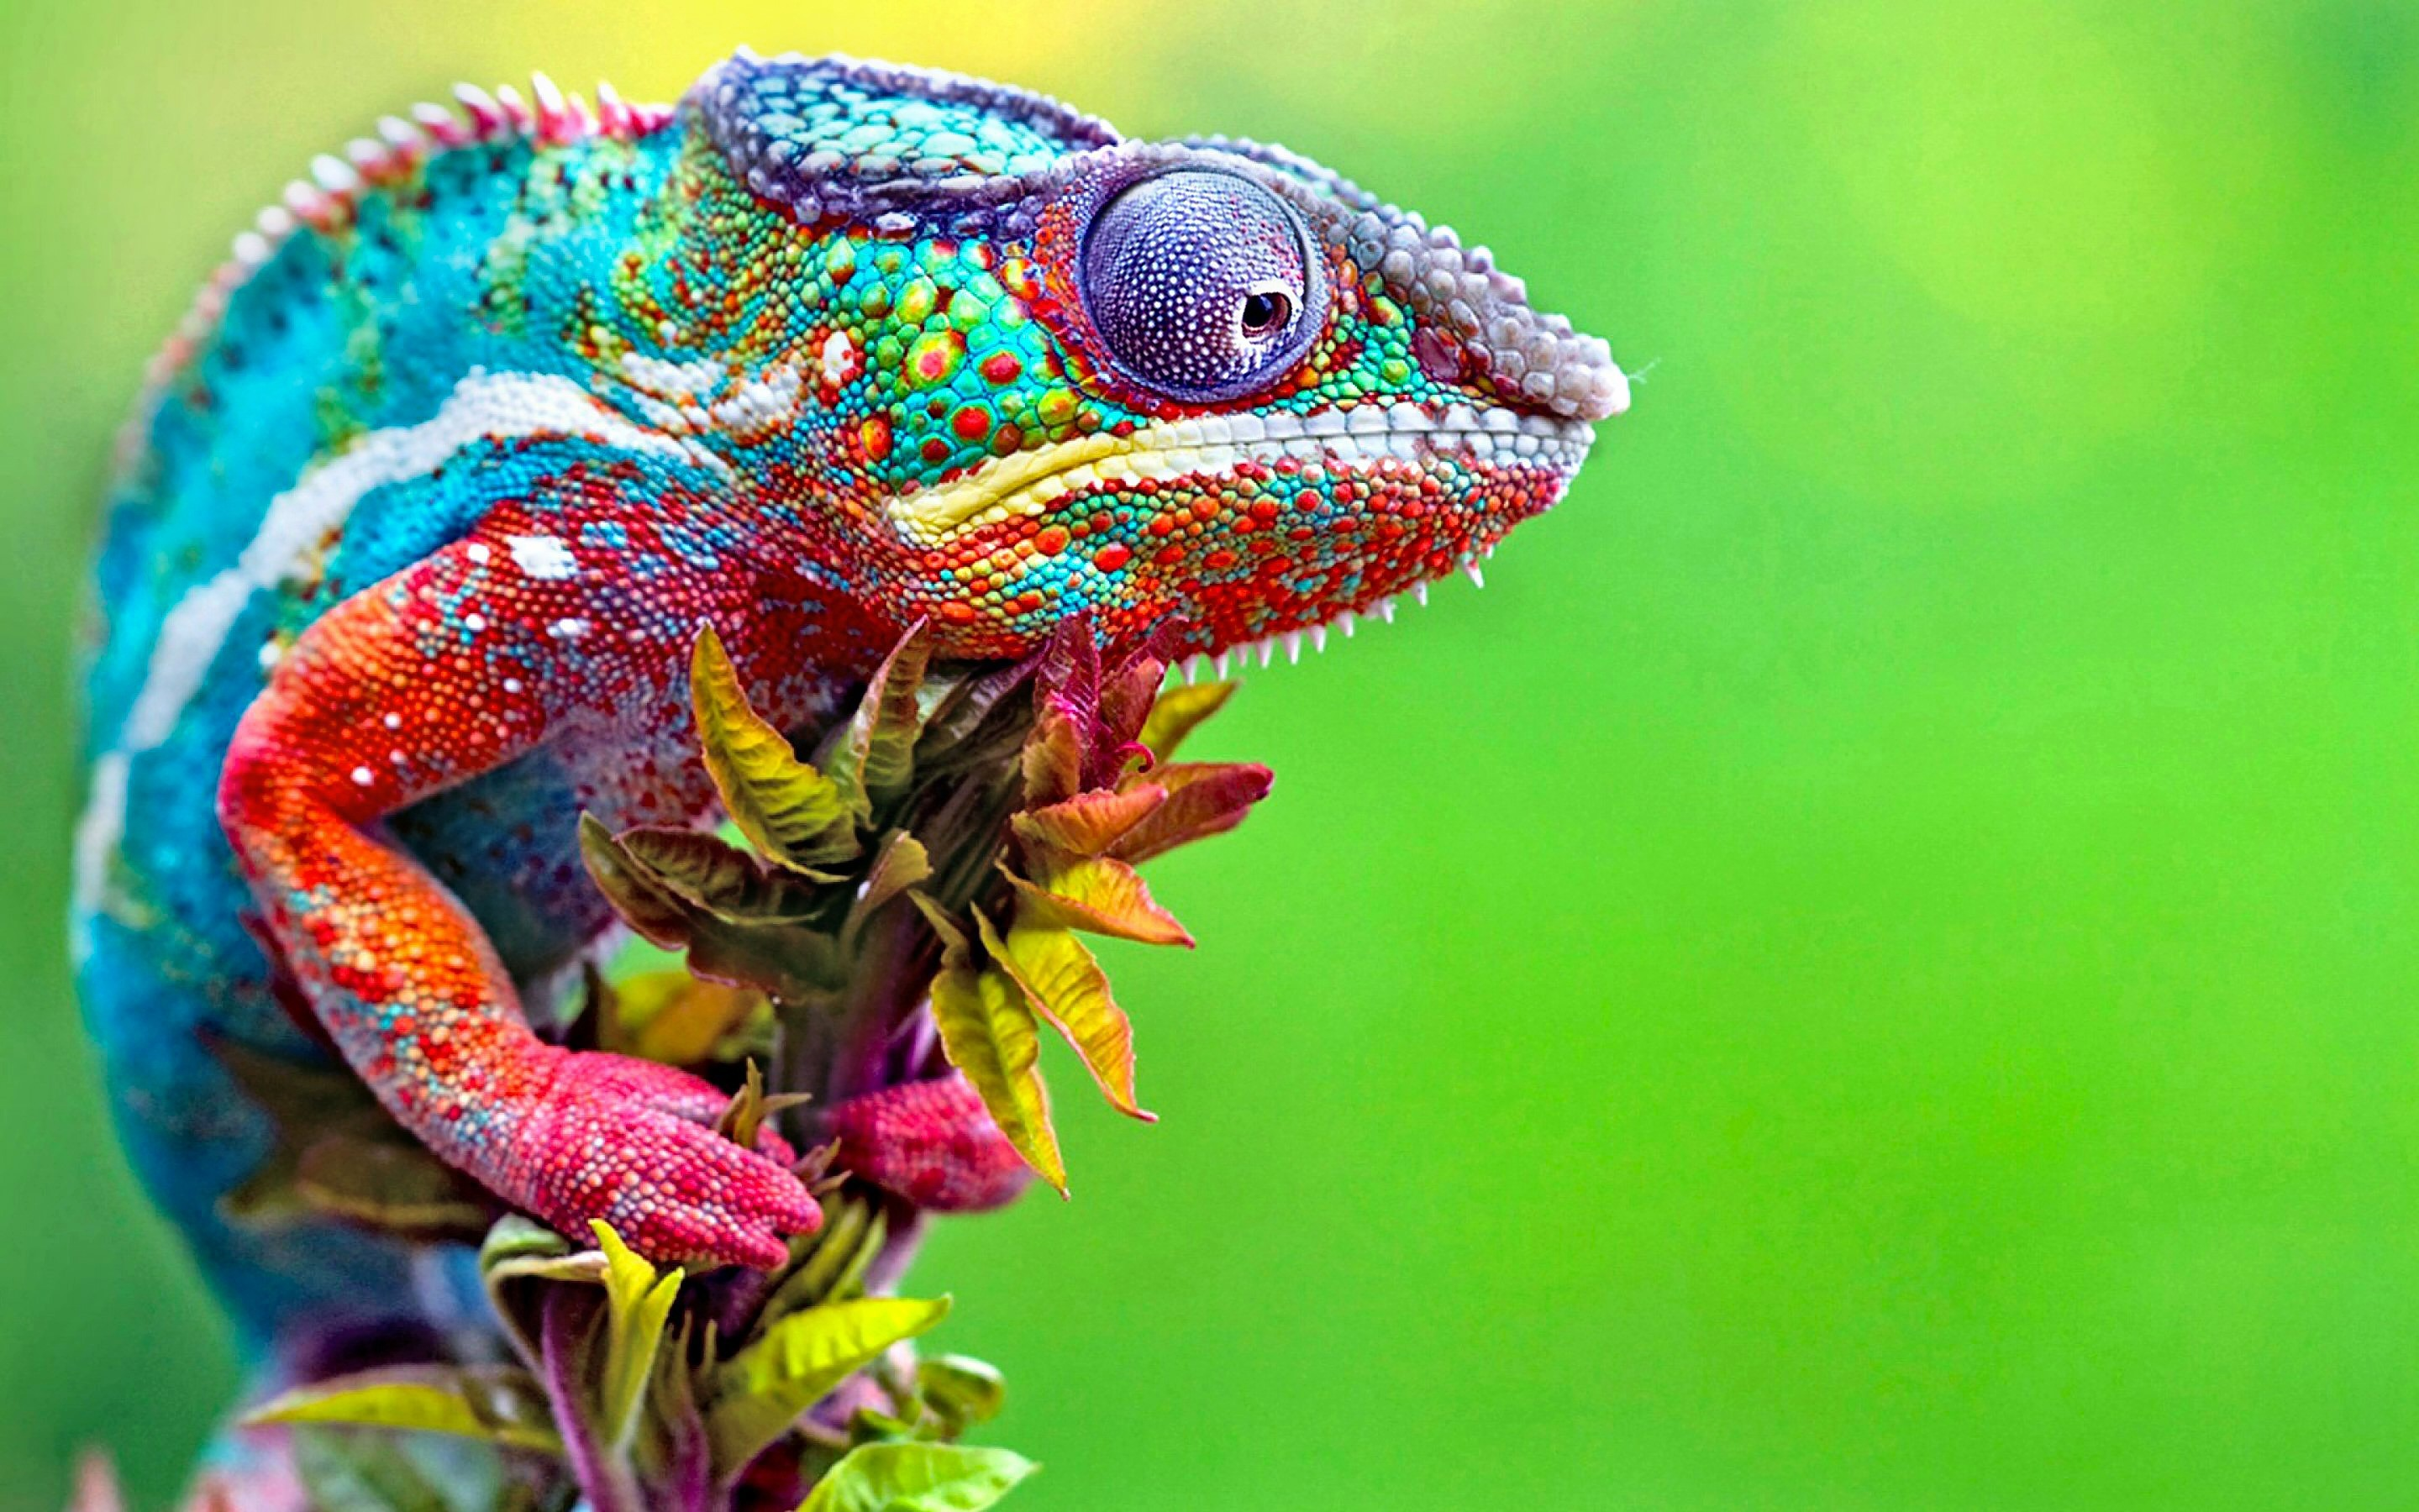 Wildes farbenfrohes Kameleon.© 2020 Graphics Illuminate/Shutterstock